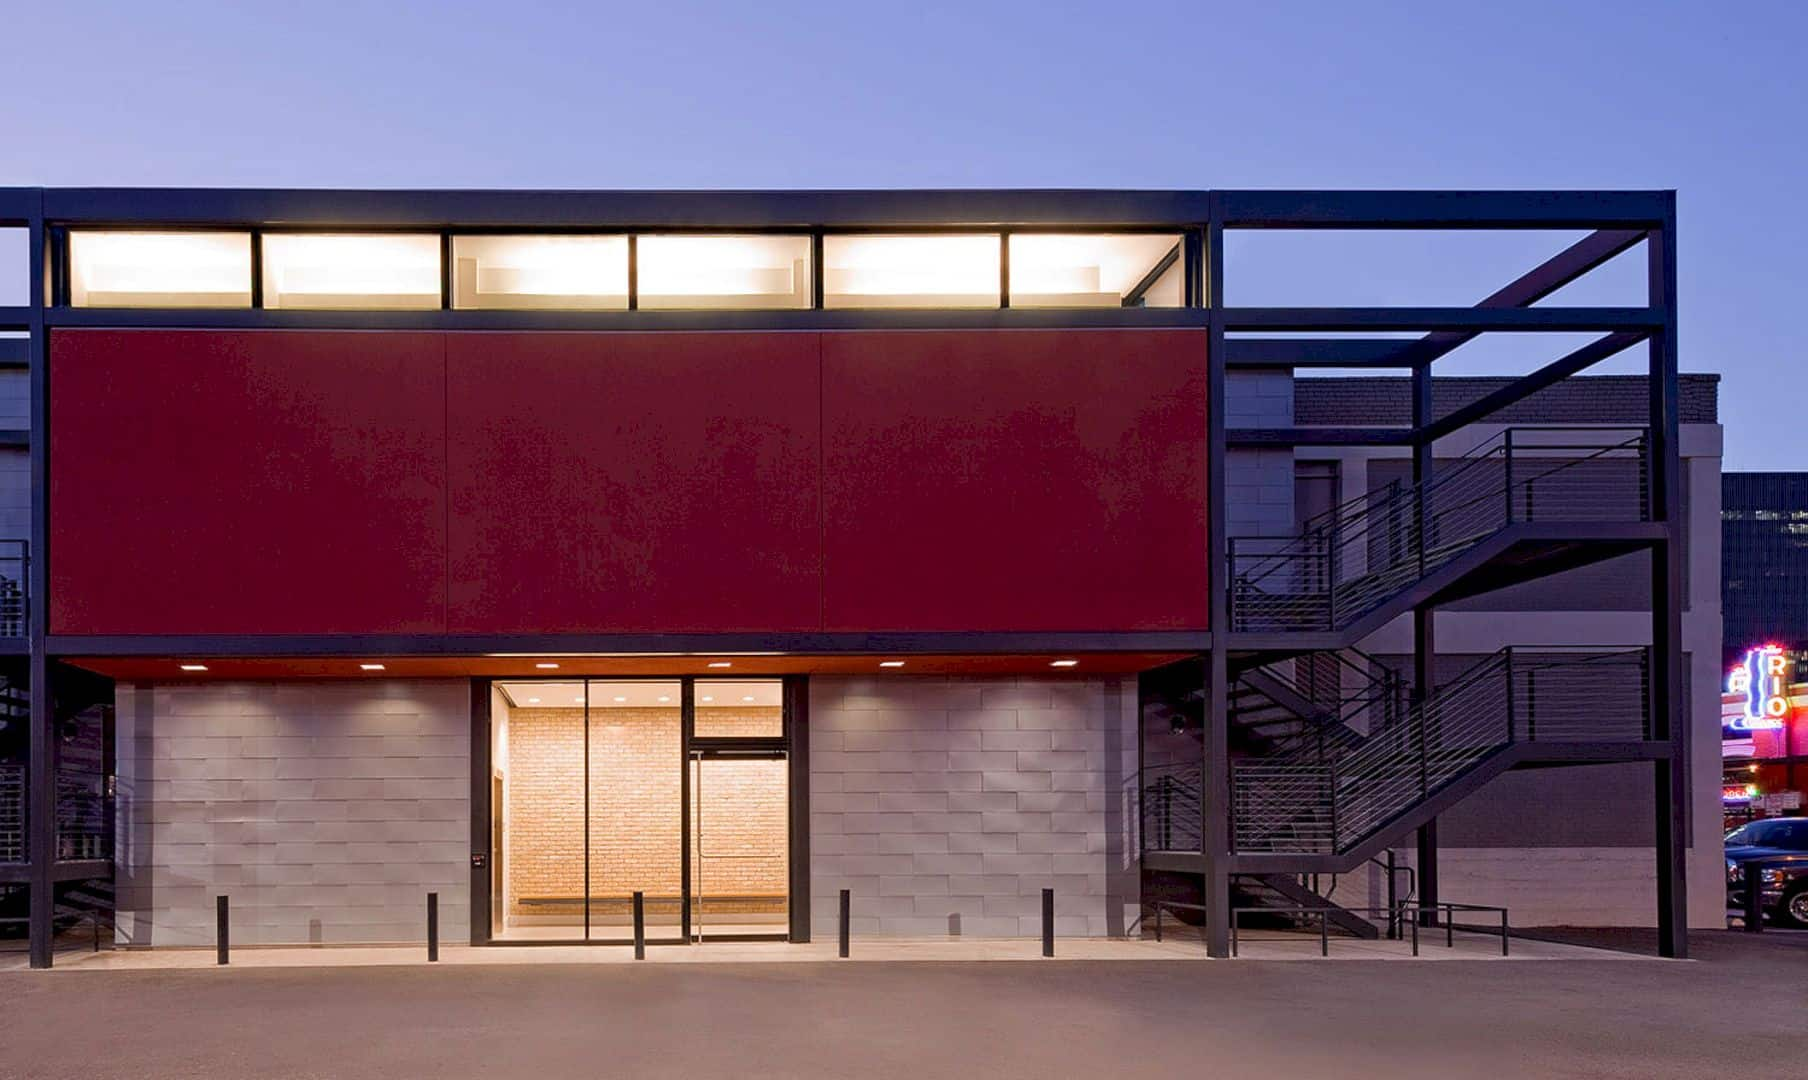 San Jacinto Building By Specht Architects 2